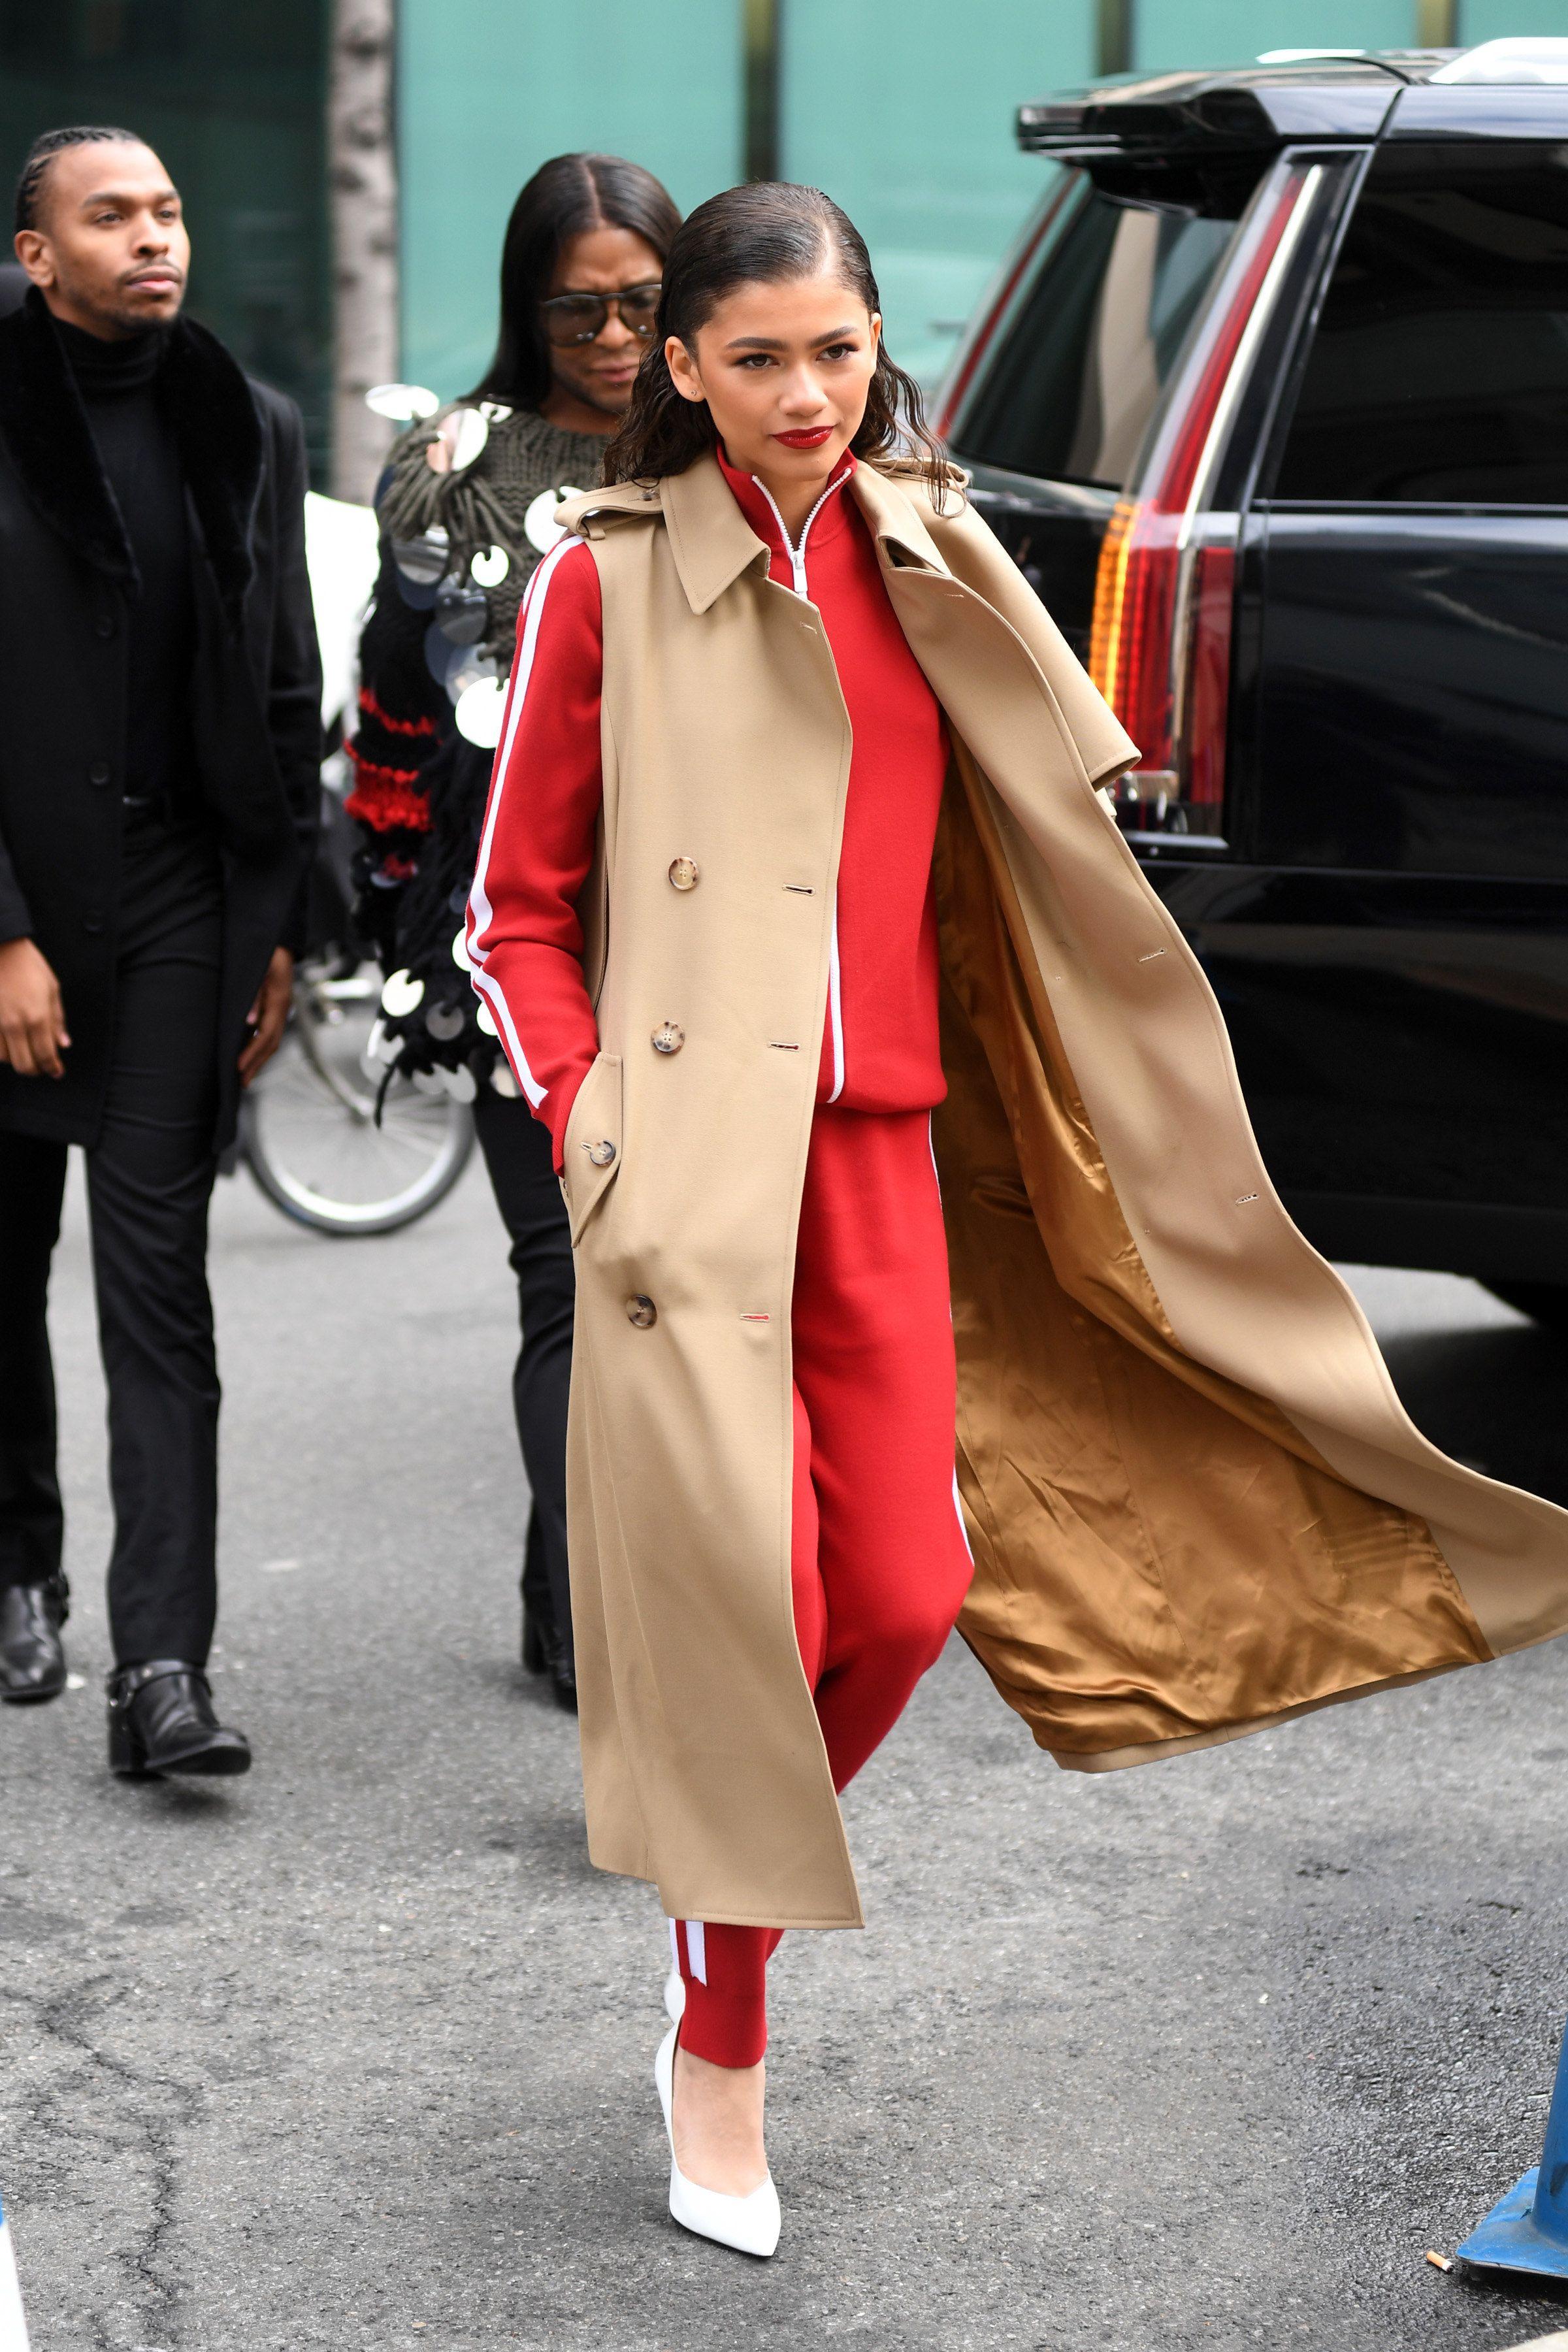 zendaya arrives at the michael kors show during the new york fashion rh pinterest com